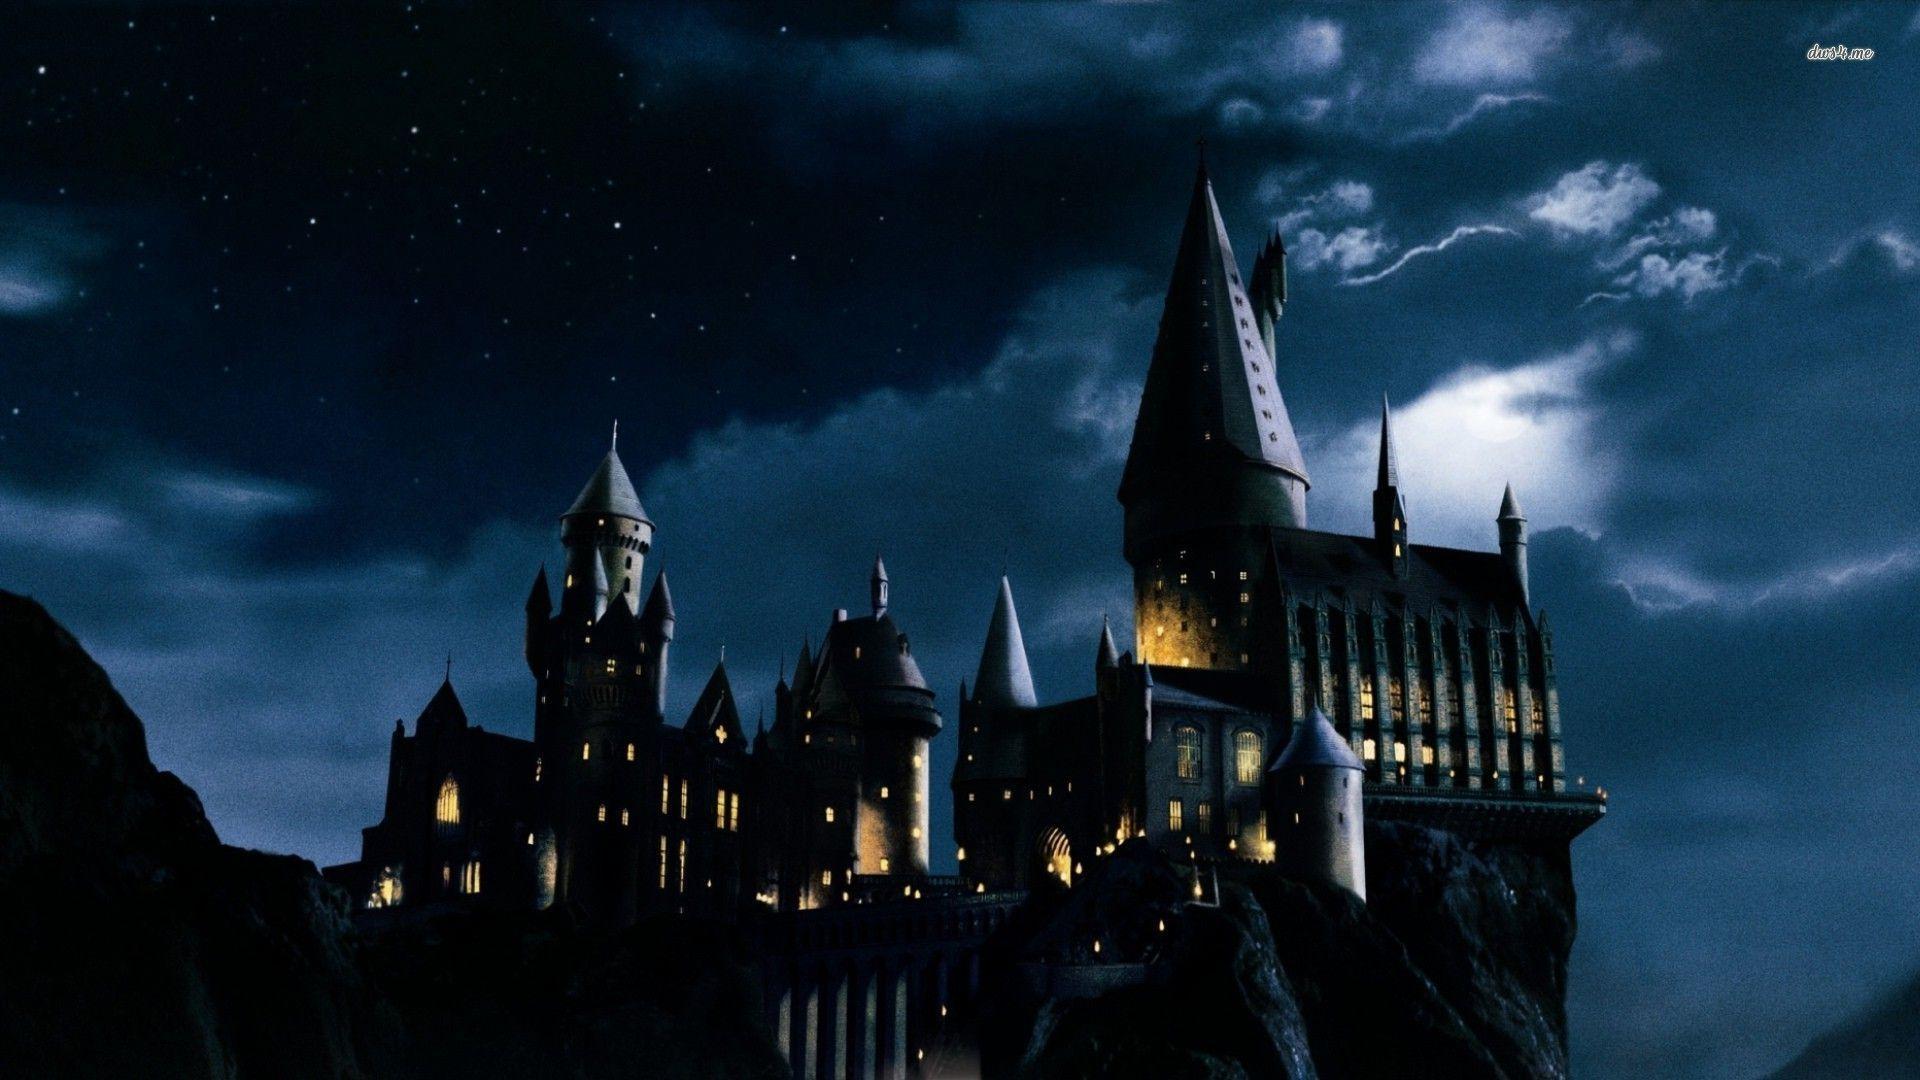 Hd Hogwarts Wallpapers Wallpaper Cave